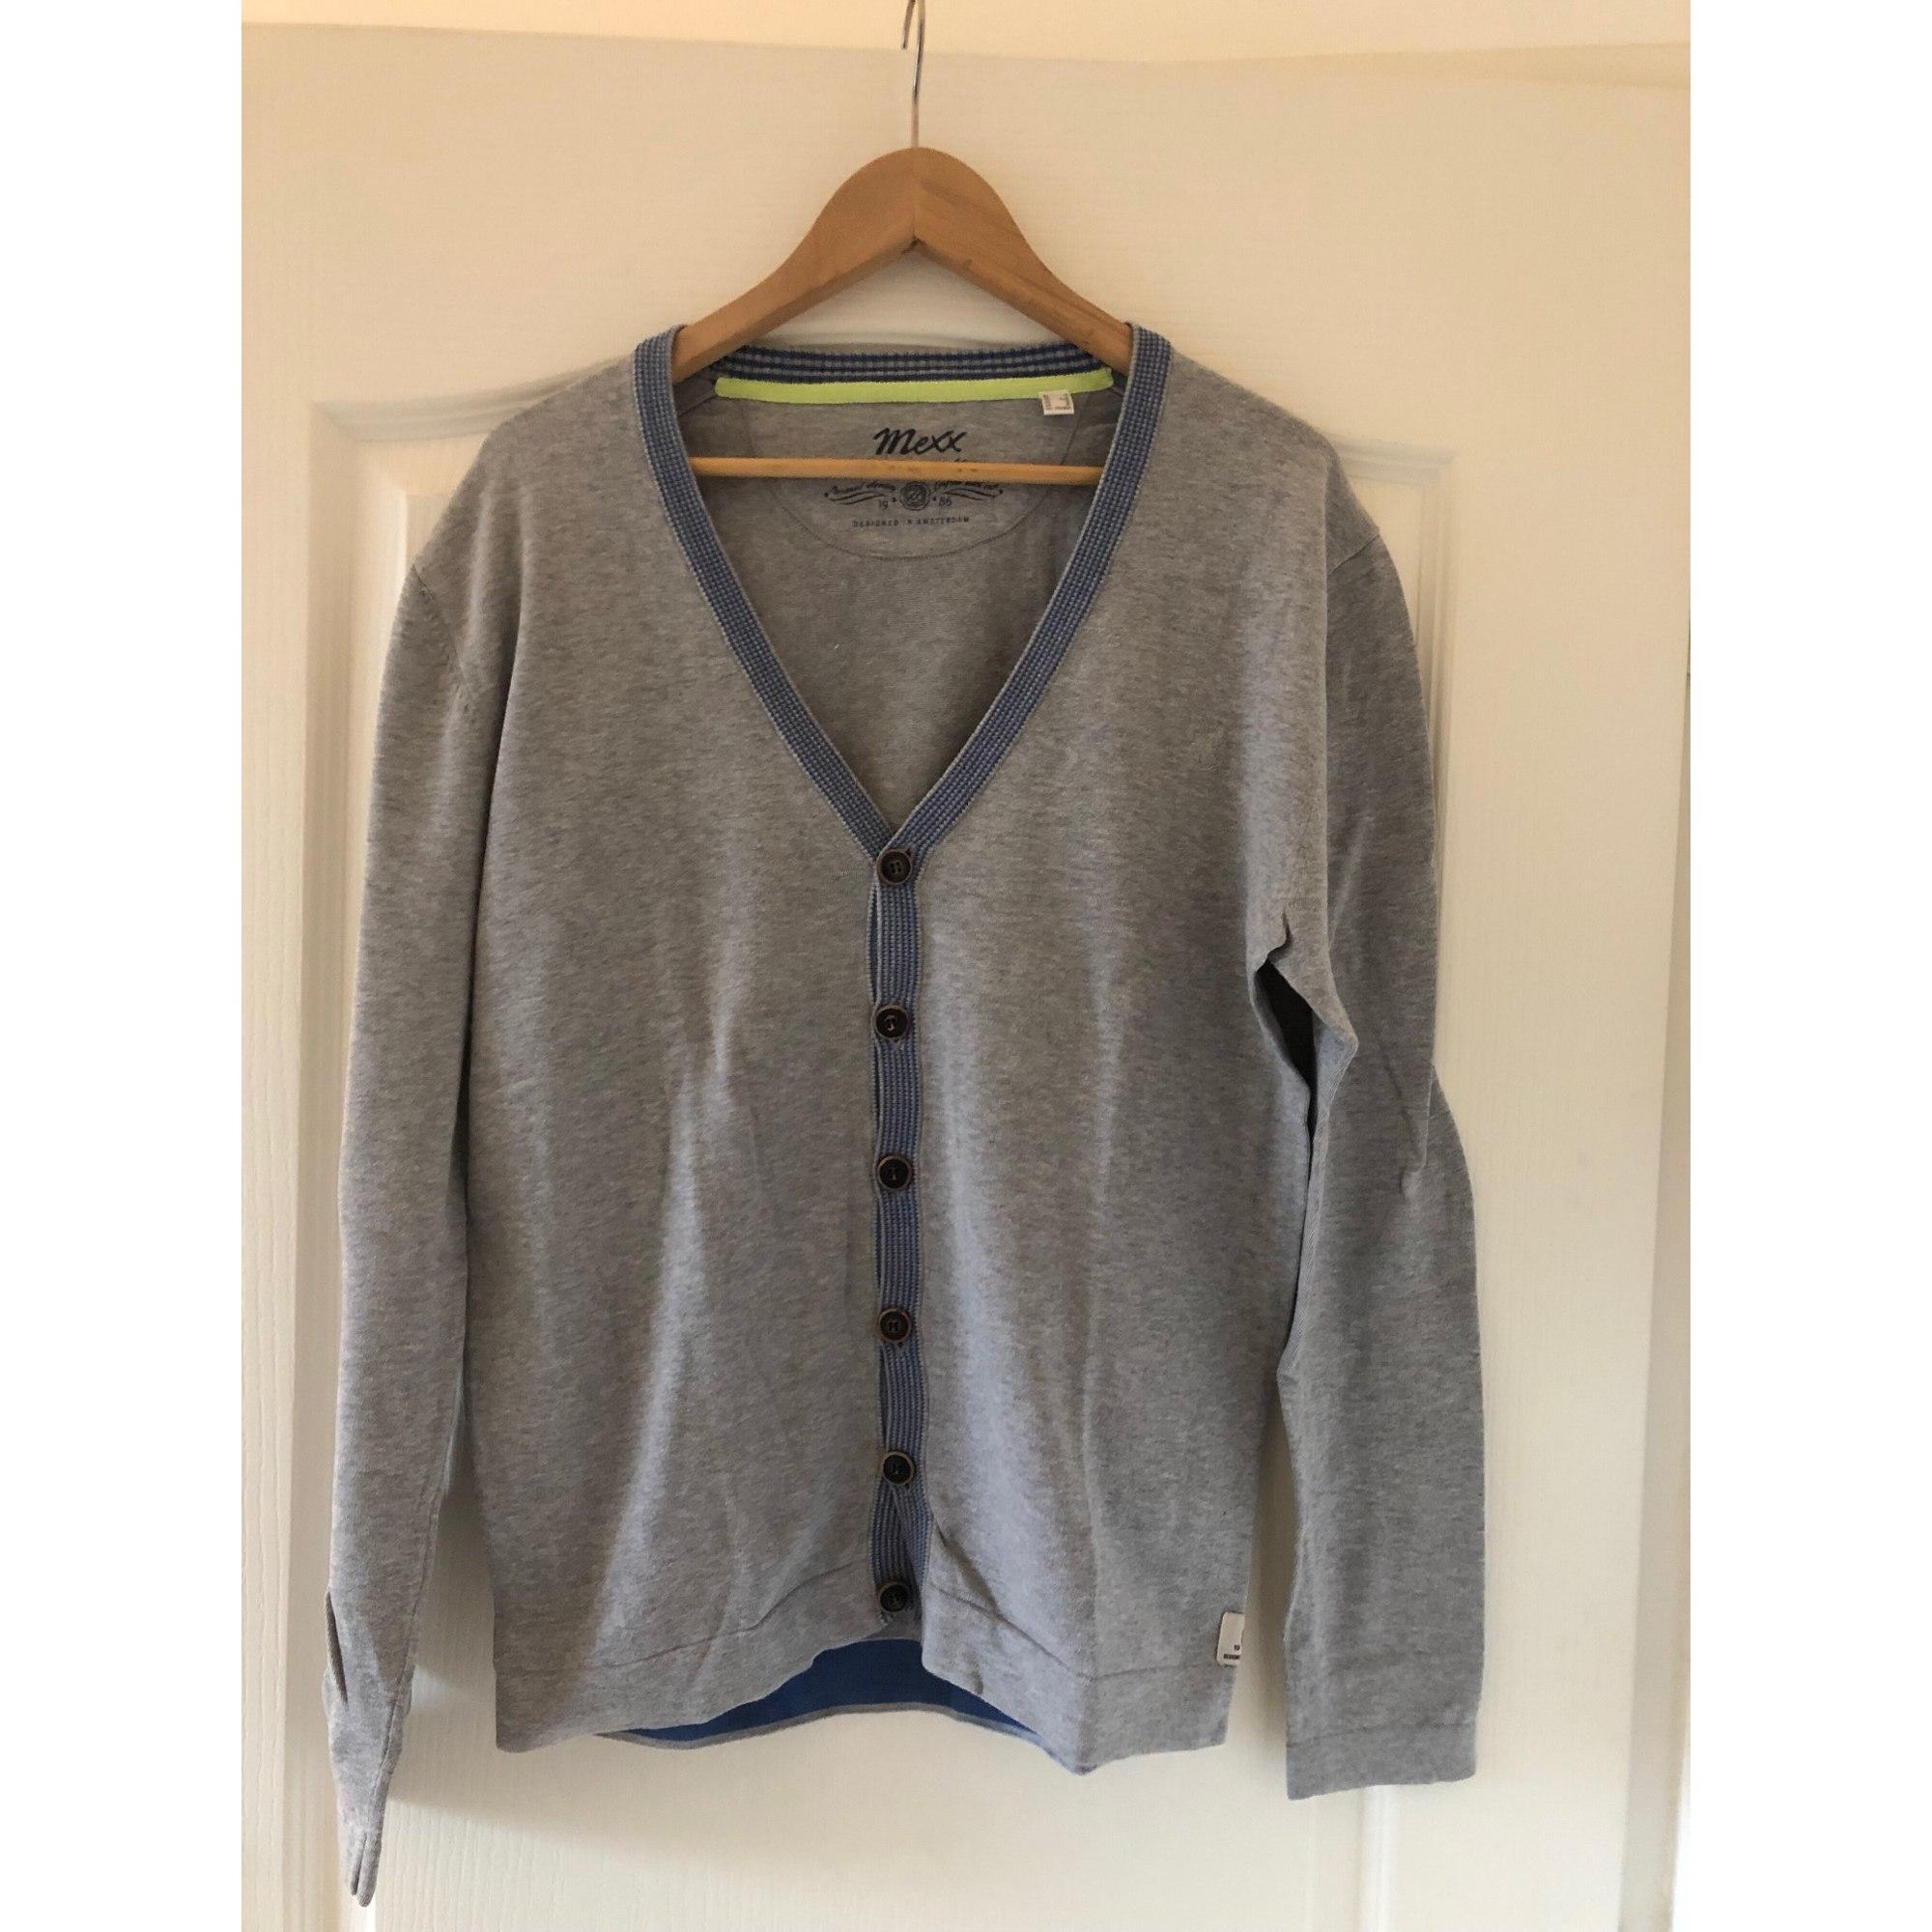 Vest, Cardigan MEXX Gray, charcoal